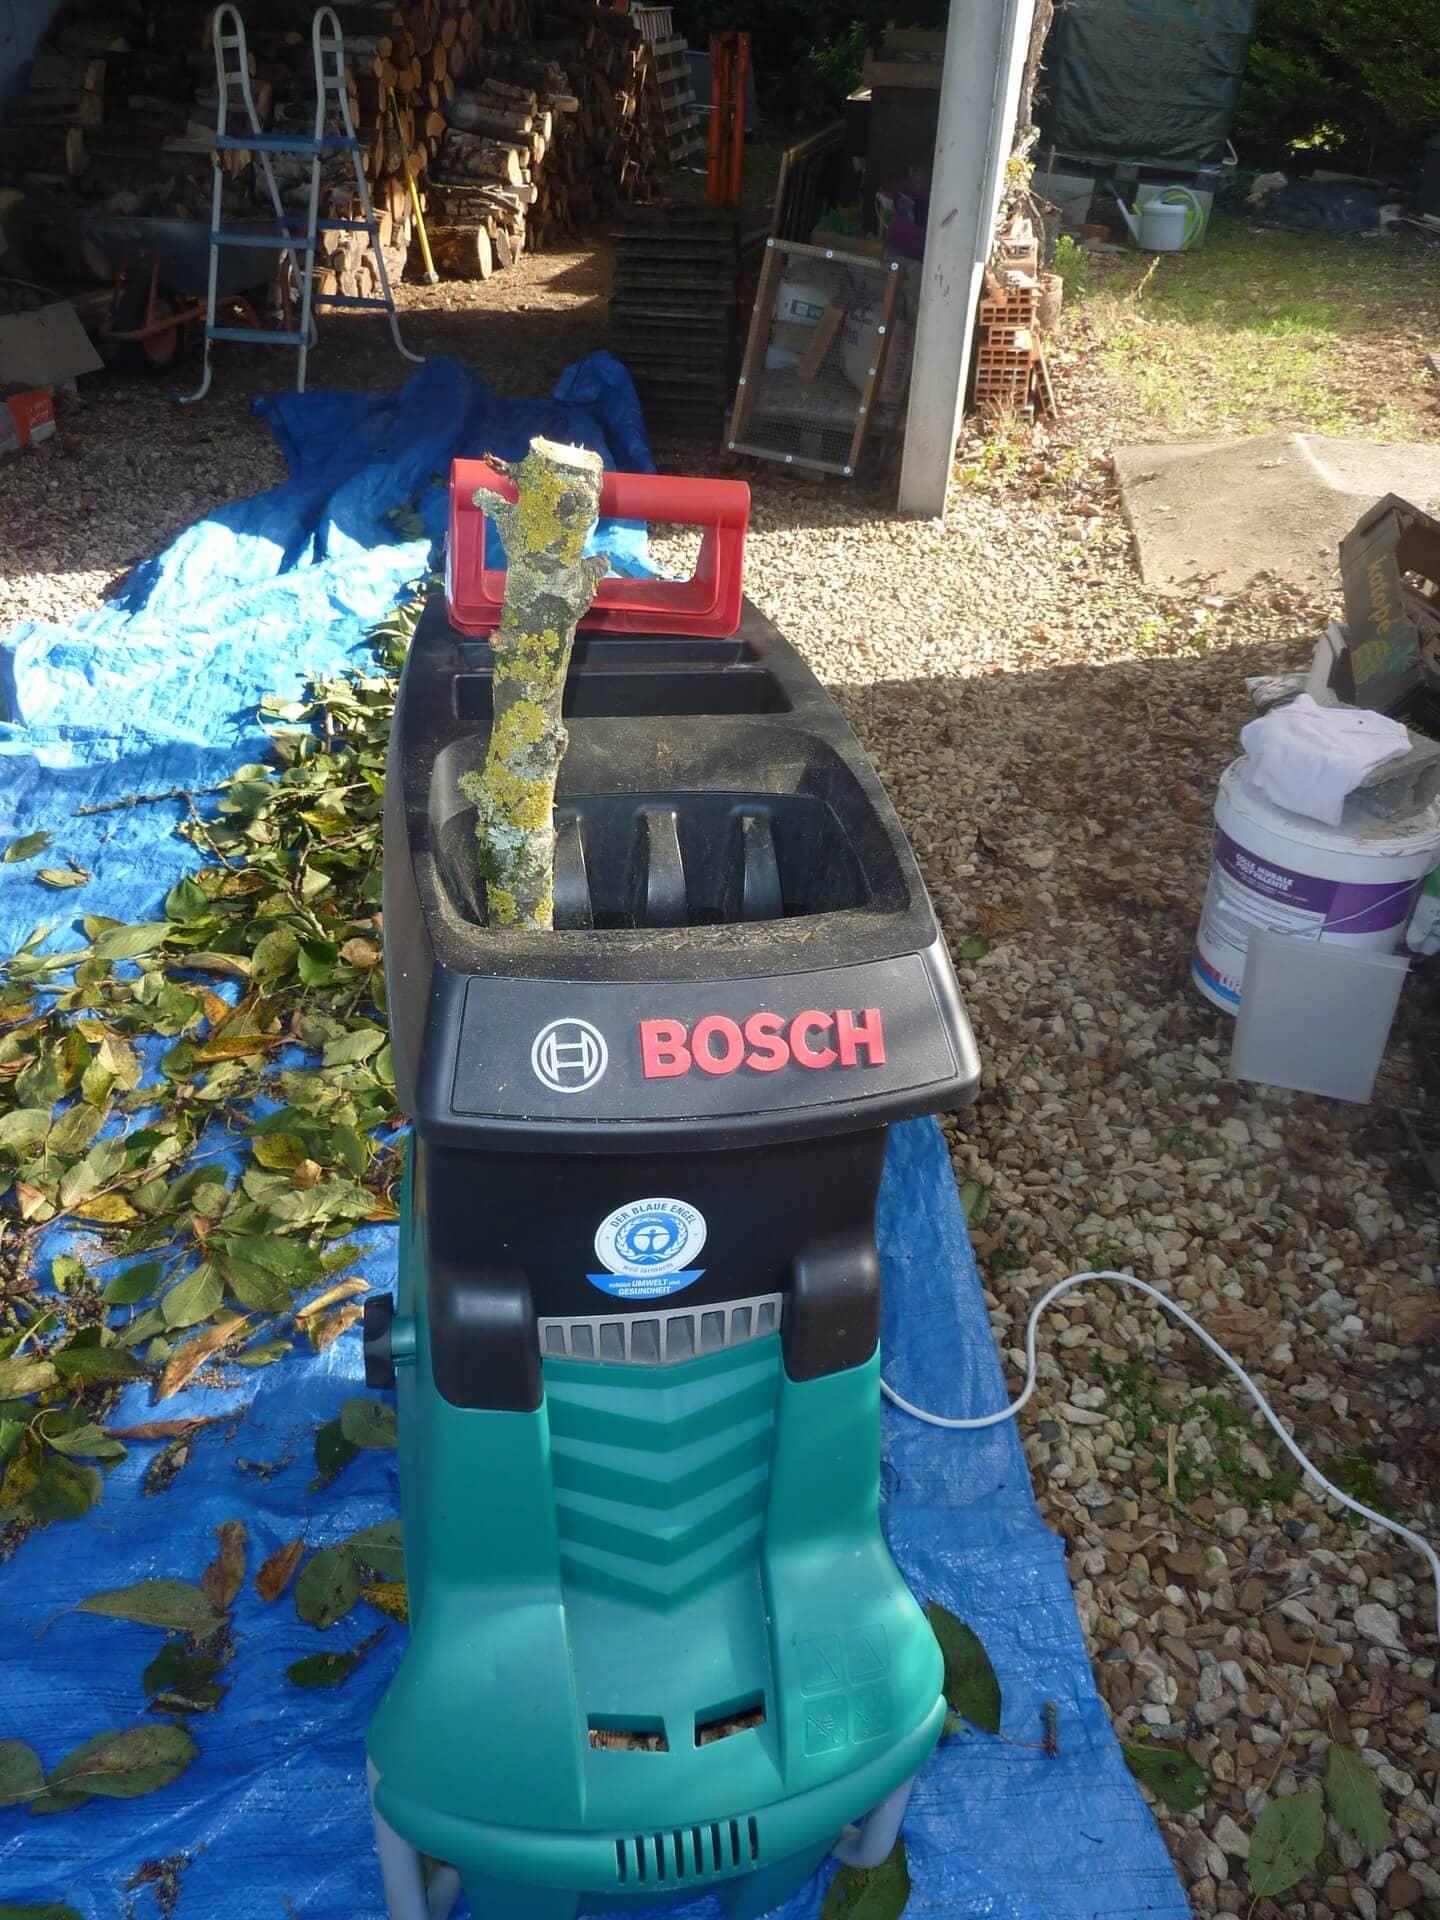 Broyeur de v g taux bosch axt 25 tc jardin shevarezo blog - Broyeur bosch axt 25 tc ...